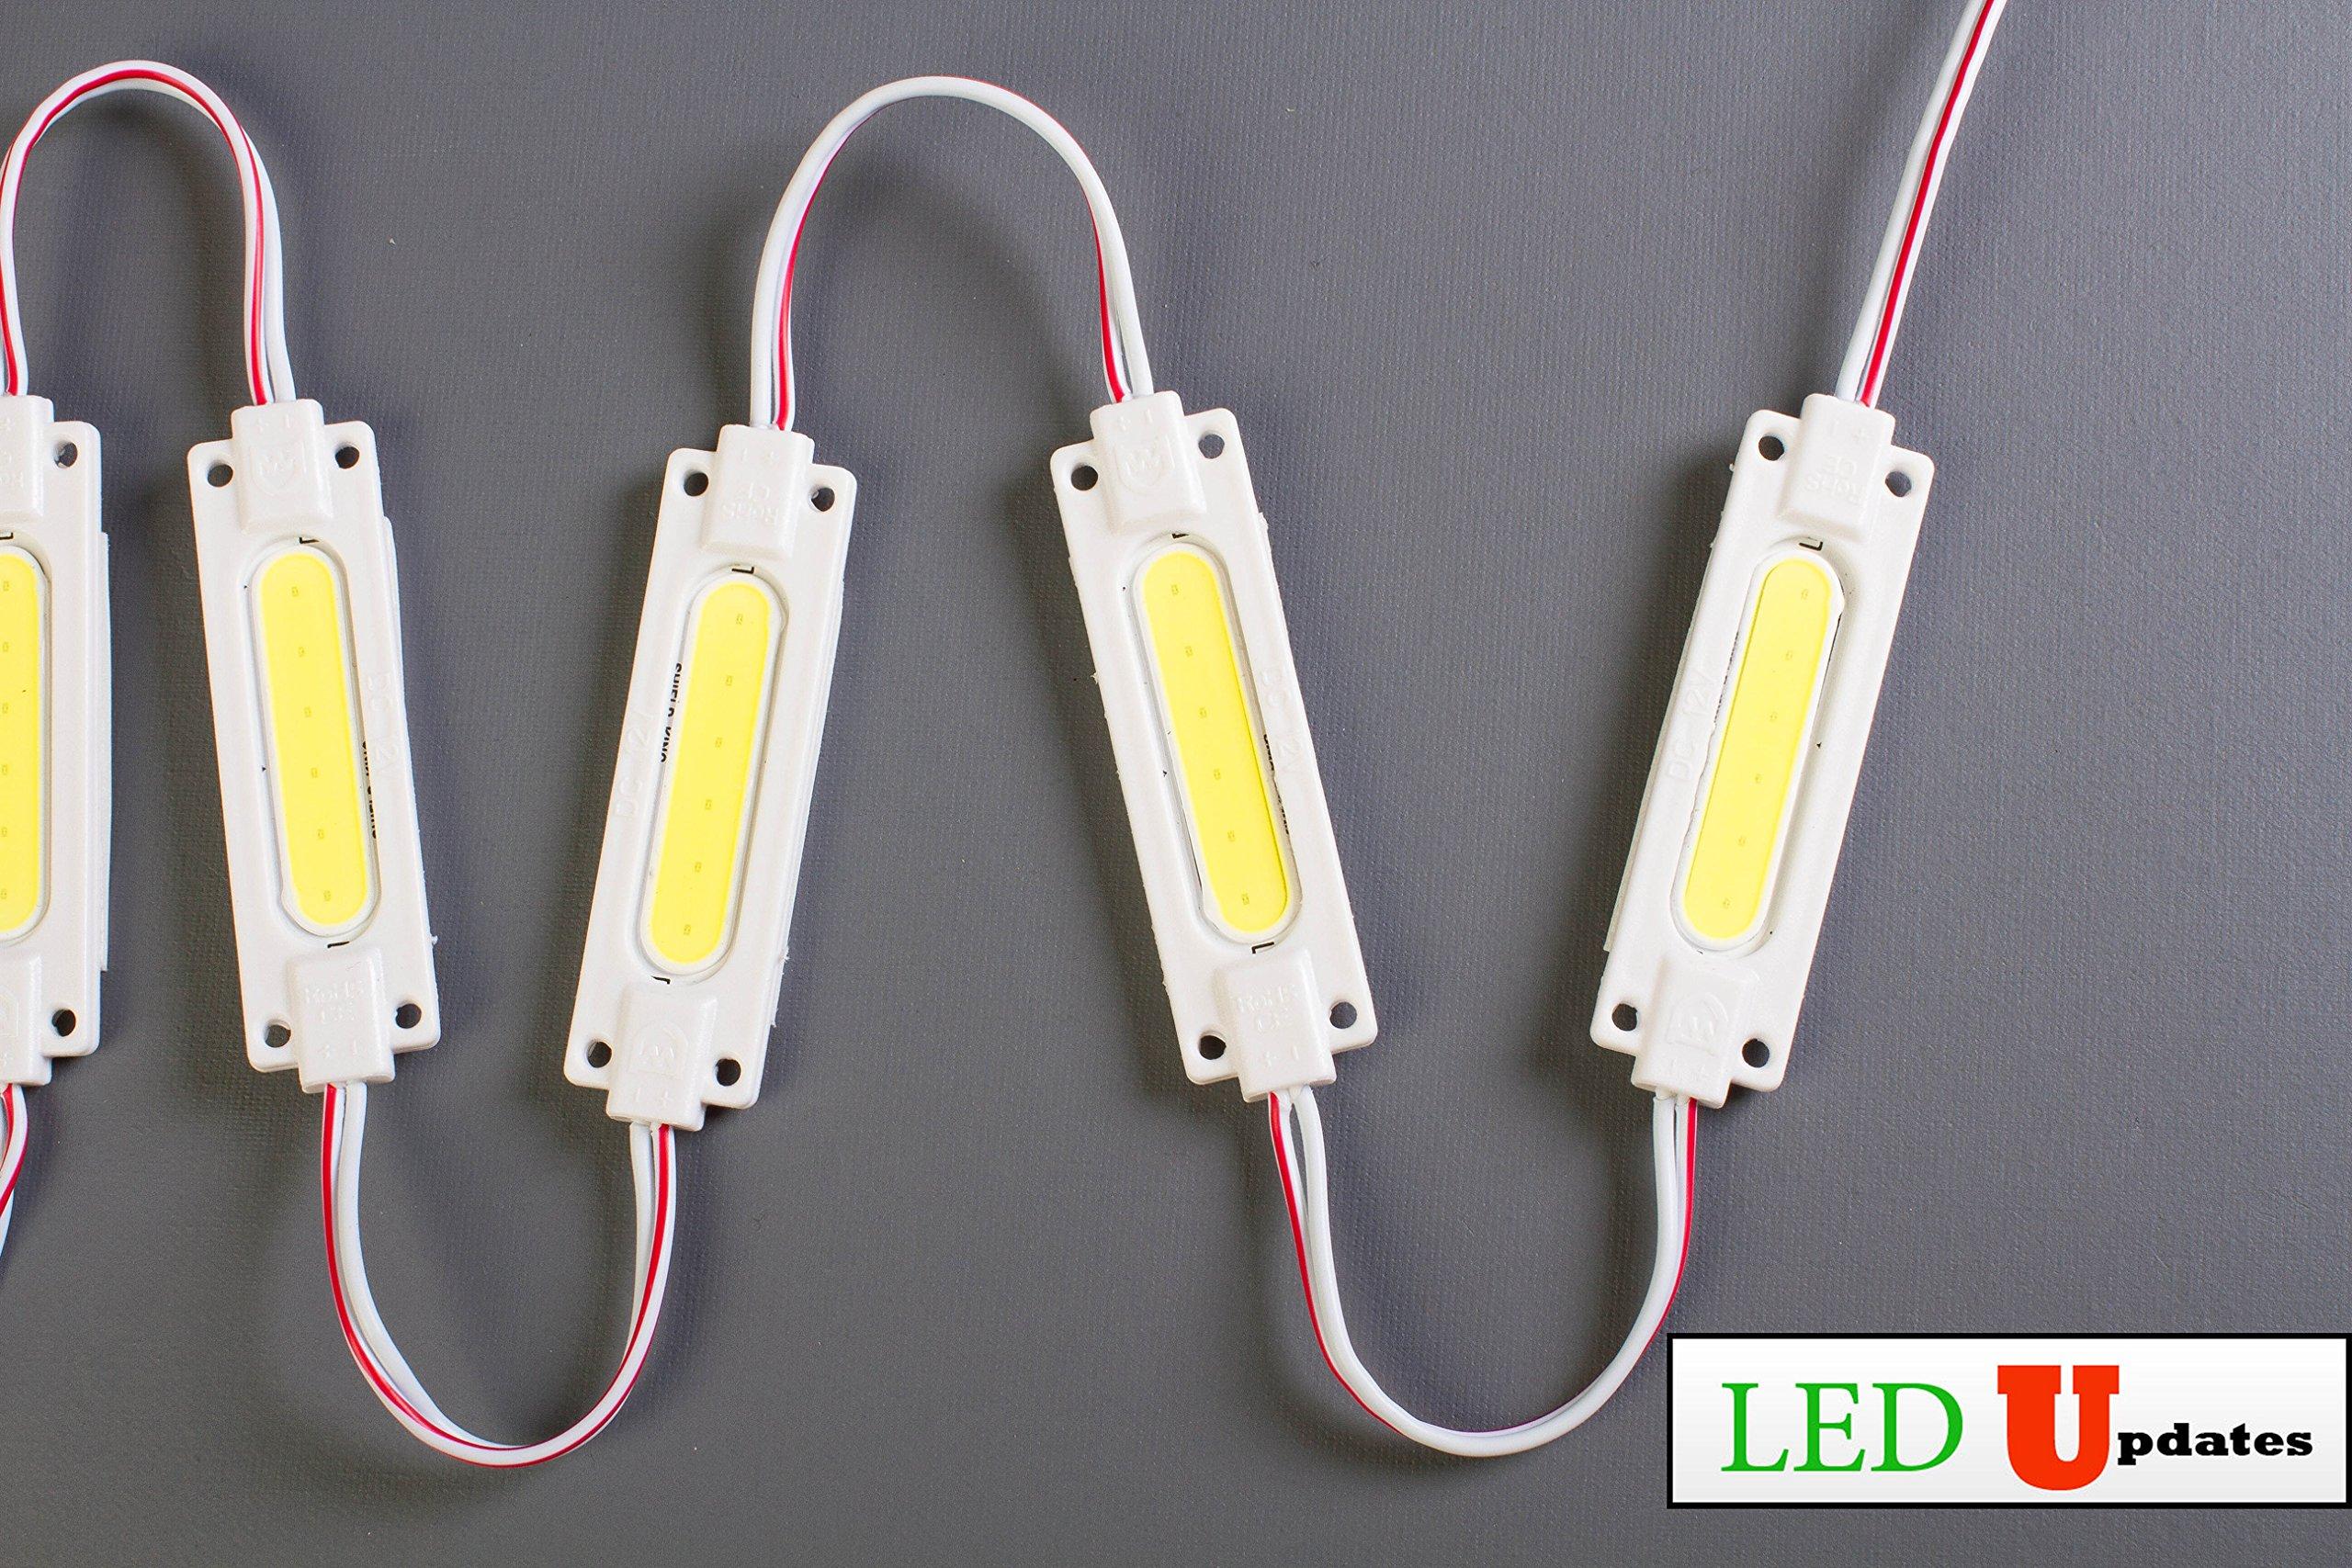 LEDUPDATES BRIGHTEST STOREFRONT WINDOW LED LIGHT COB WITH UL POWER SUPPLY BRIGHTER THAN 5050 5630 5730 2835 (20ft, White) by LEDUPDATES (Image #5)